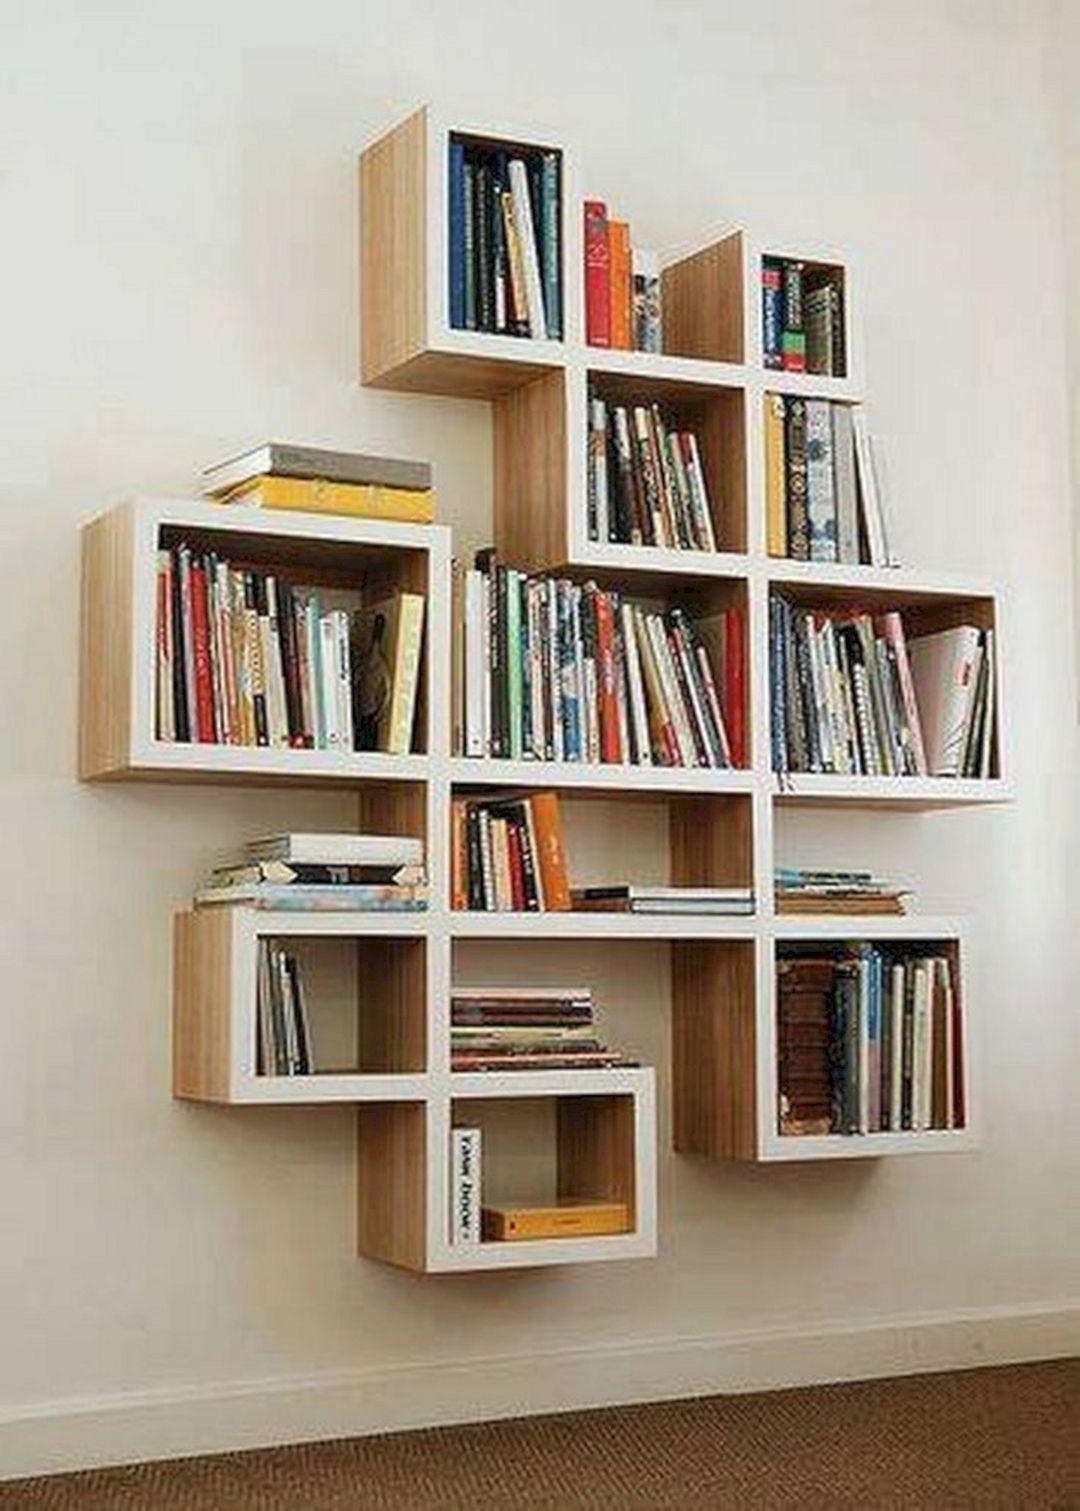 12 unique diy bookshelf ideas for best home organization